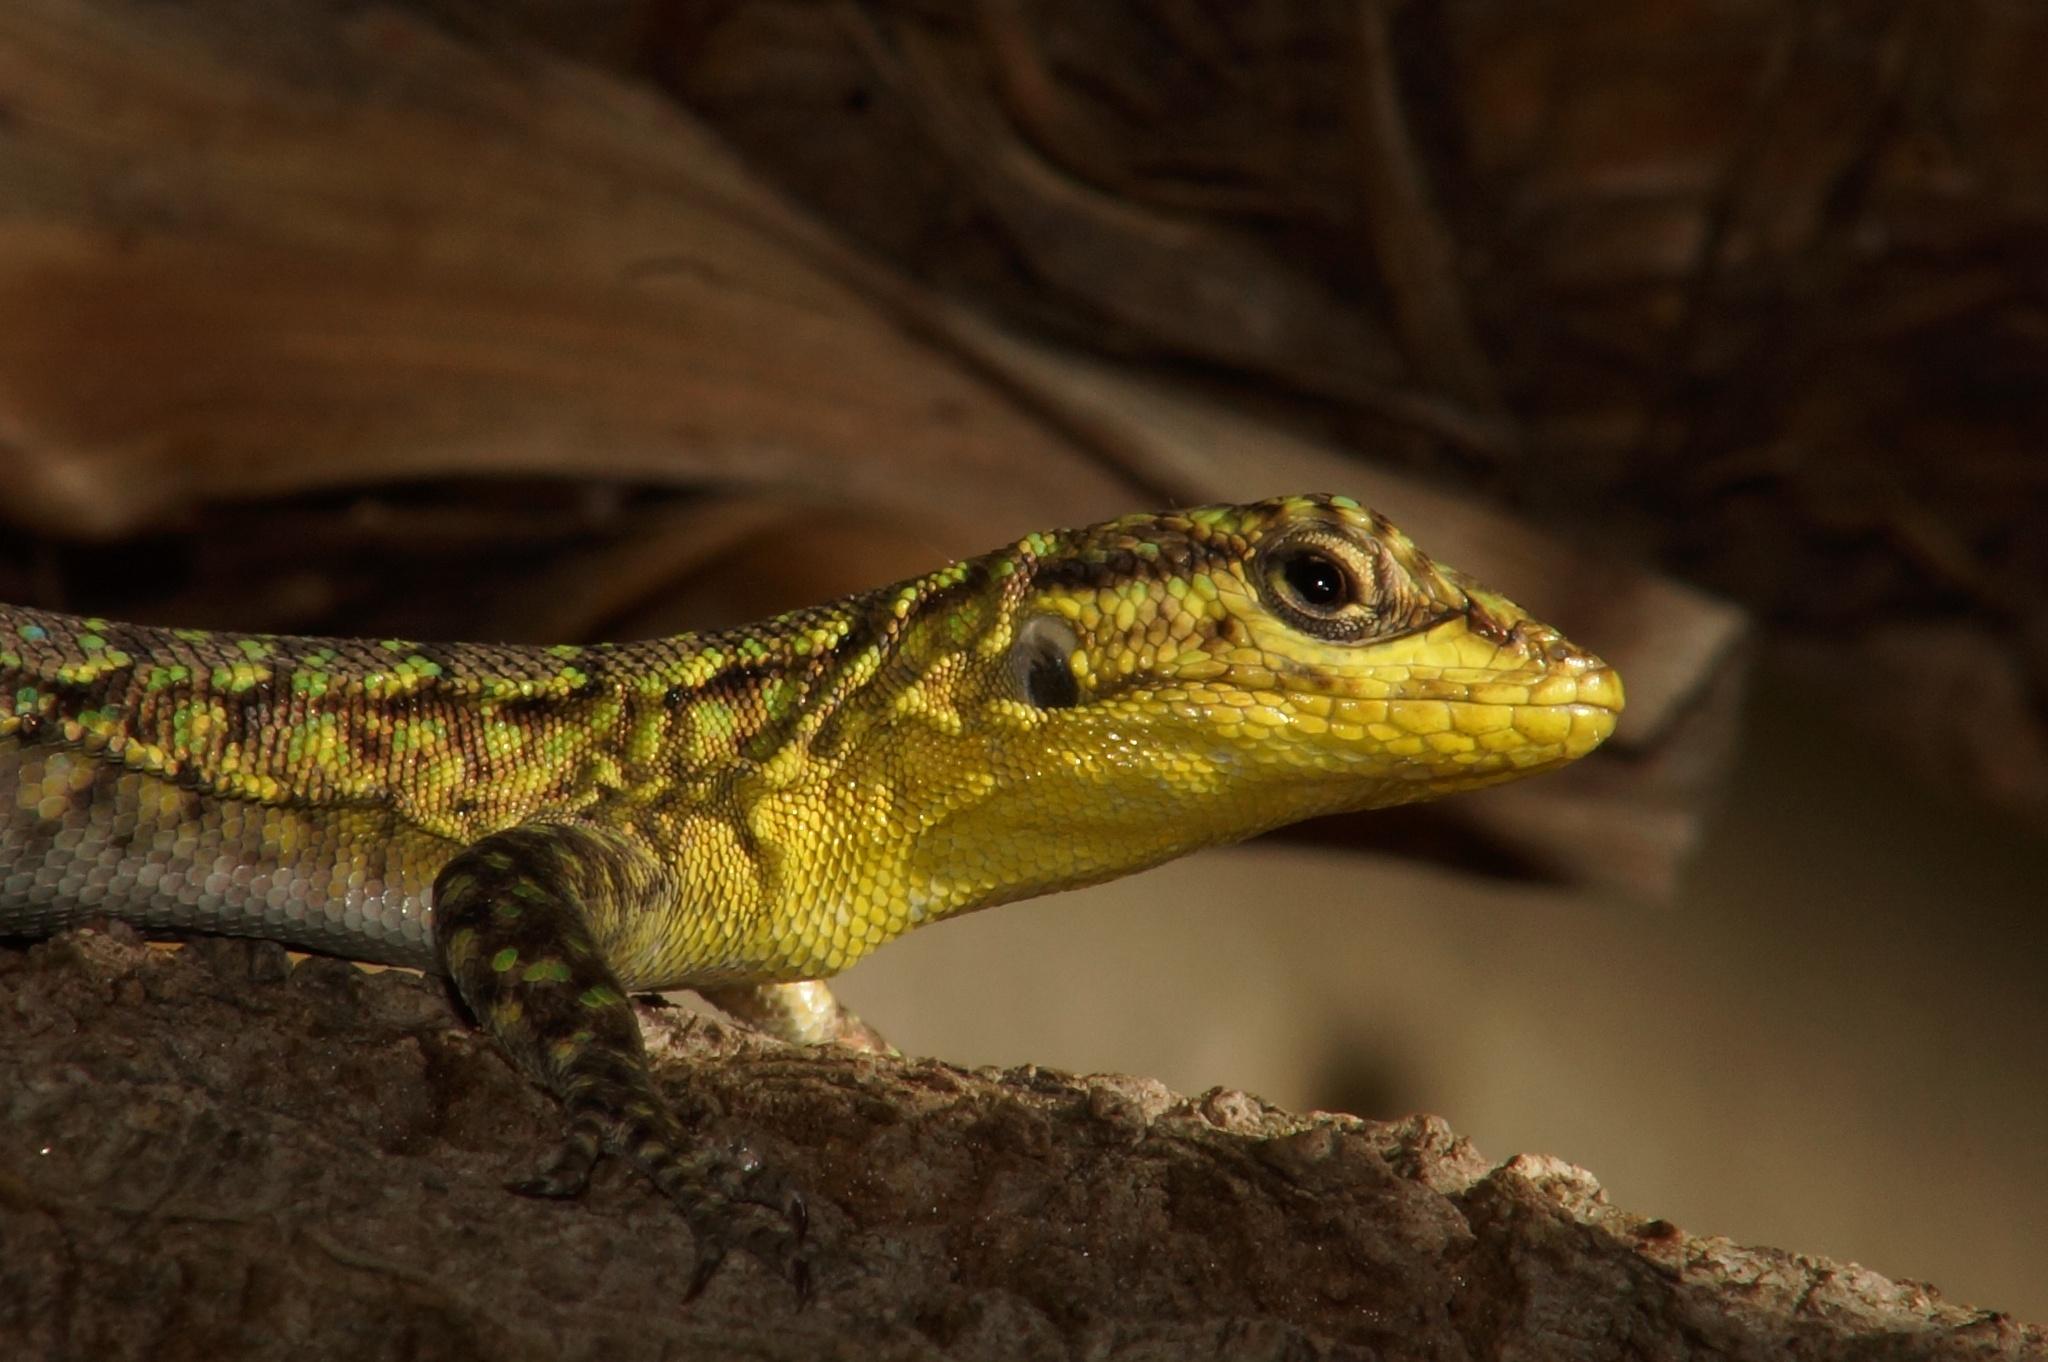 lizard 2 by incaptus331173264